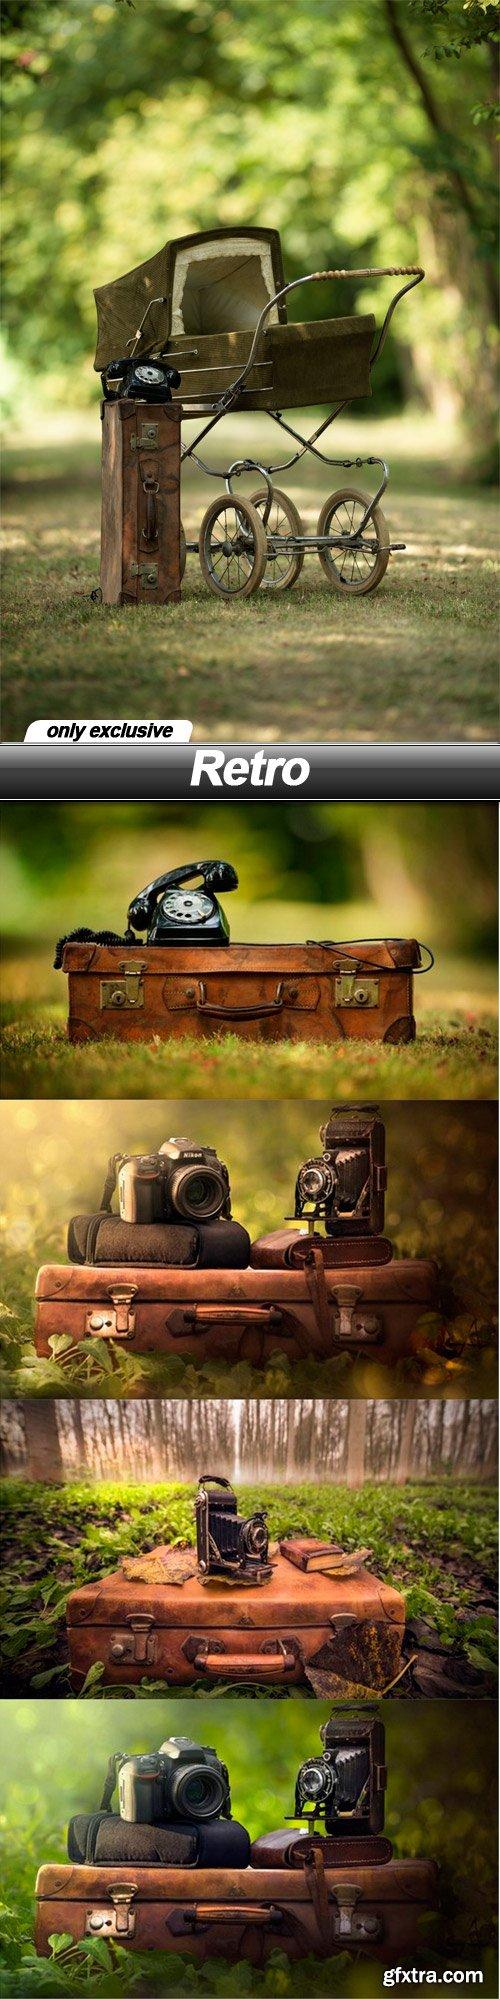 Retro - 5 UHQ JPEG